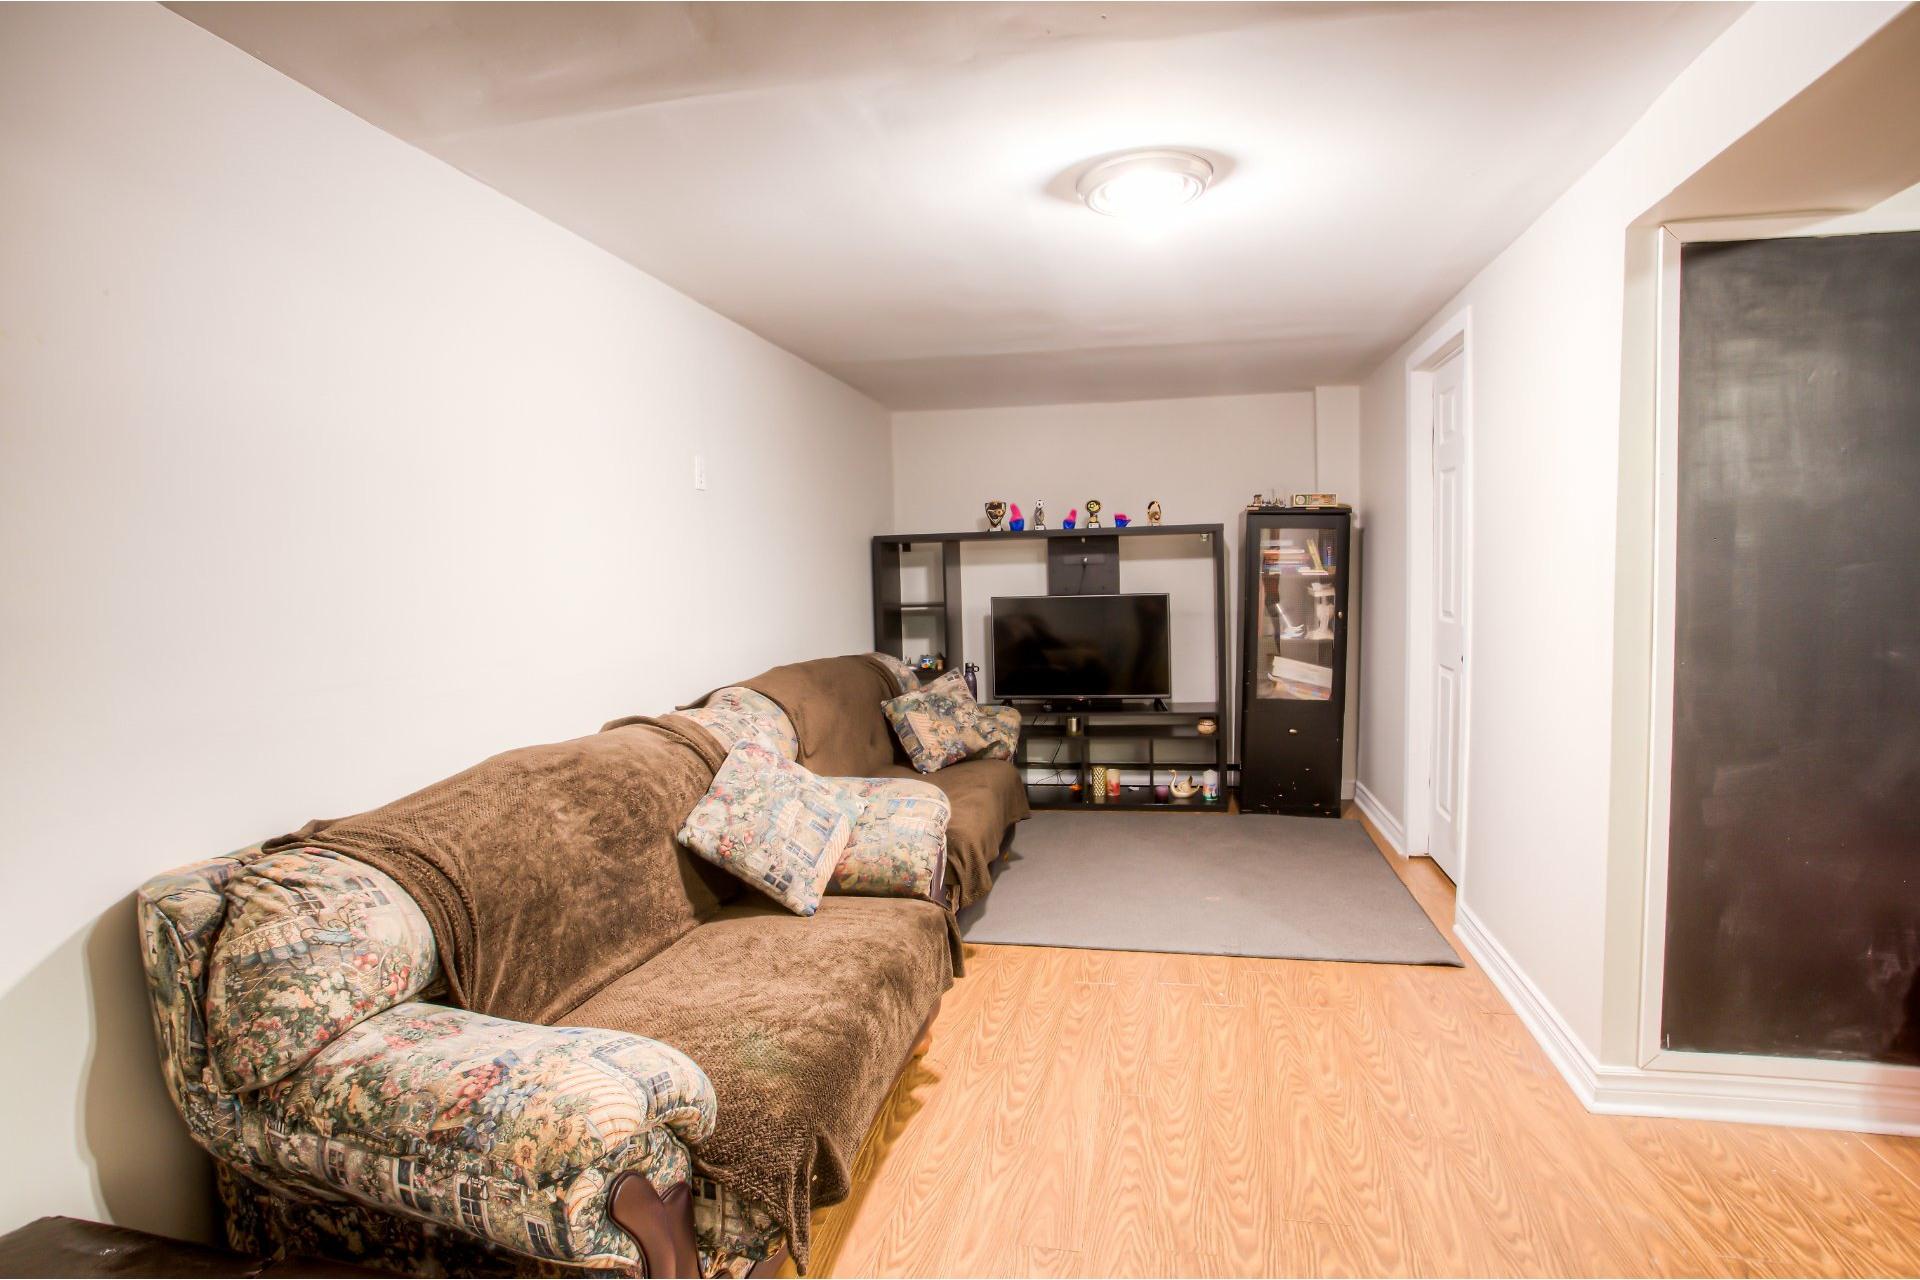 image 21 - House For rent Pierrefonds-Roxboro Montréal  - 9 rooms